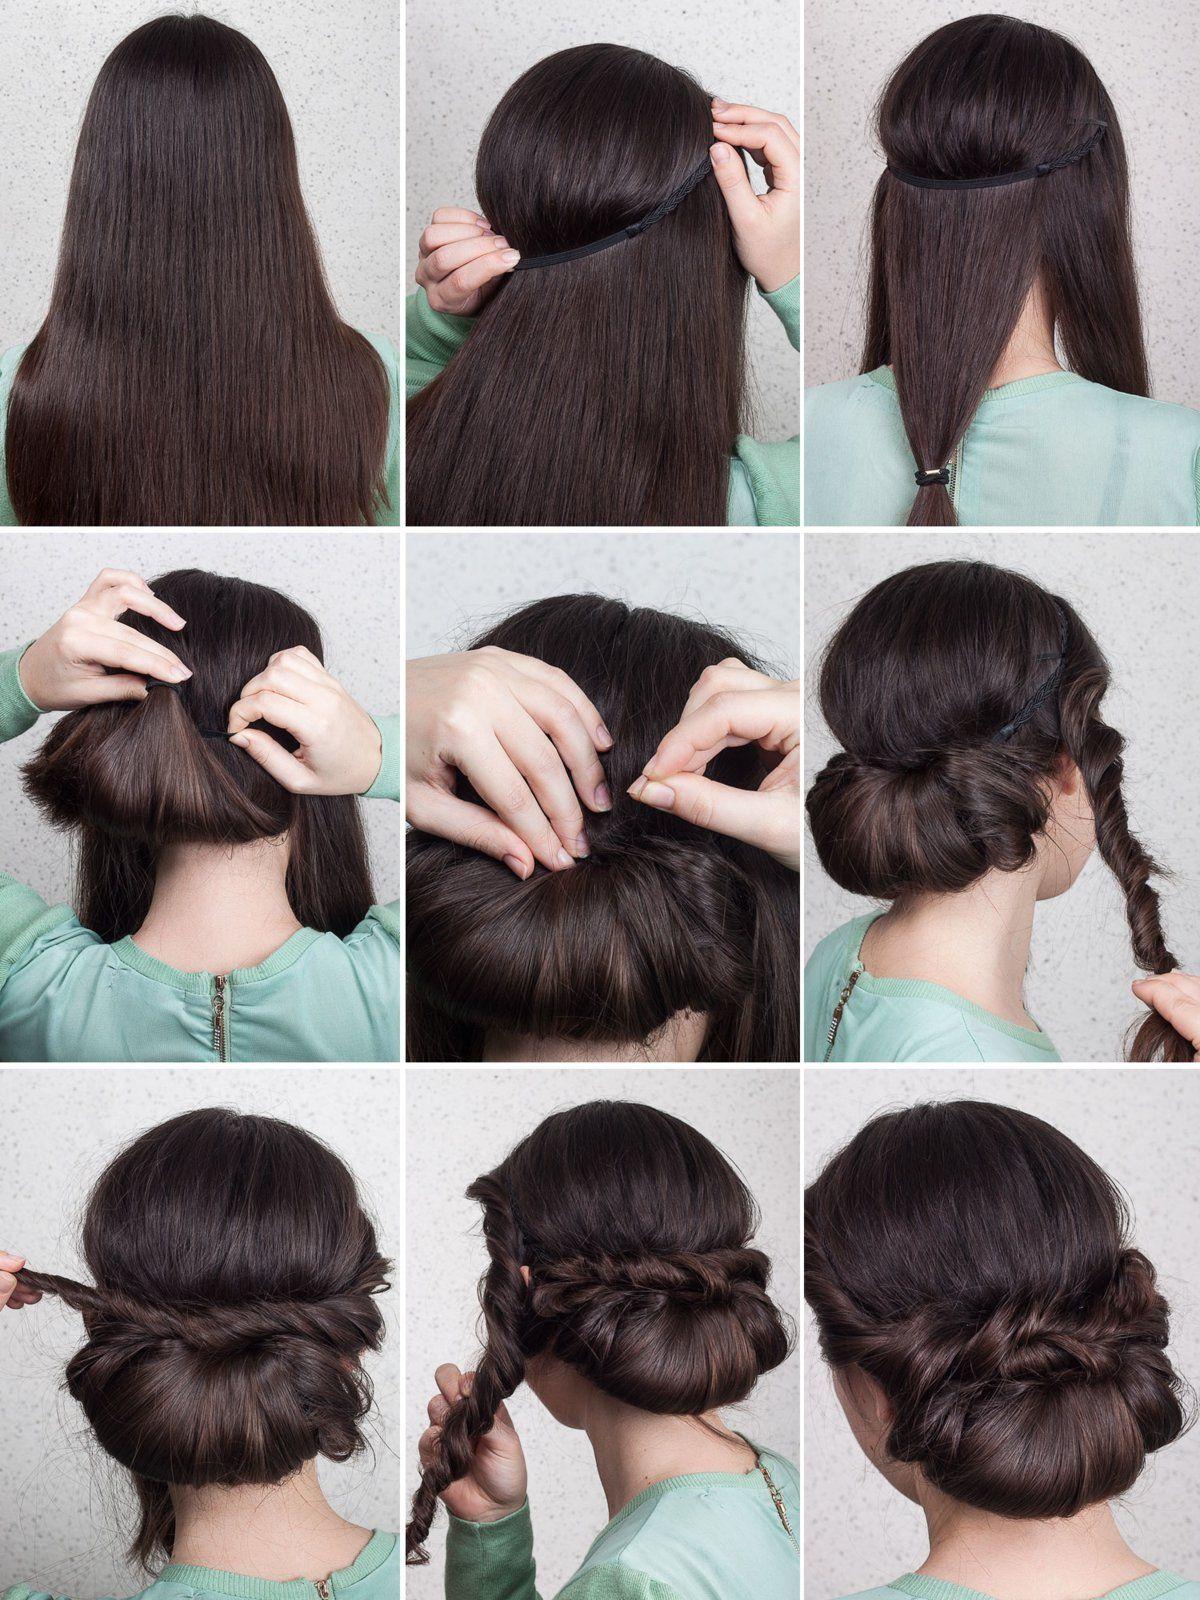 Absolute Trendfrisur In Nur 2 Minuten! Haarknoten Haarklemmen